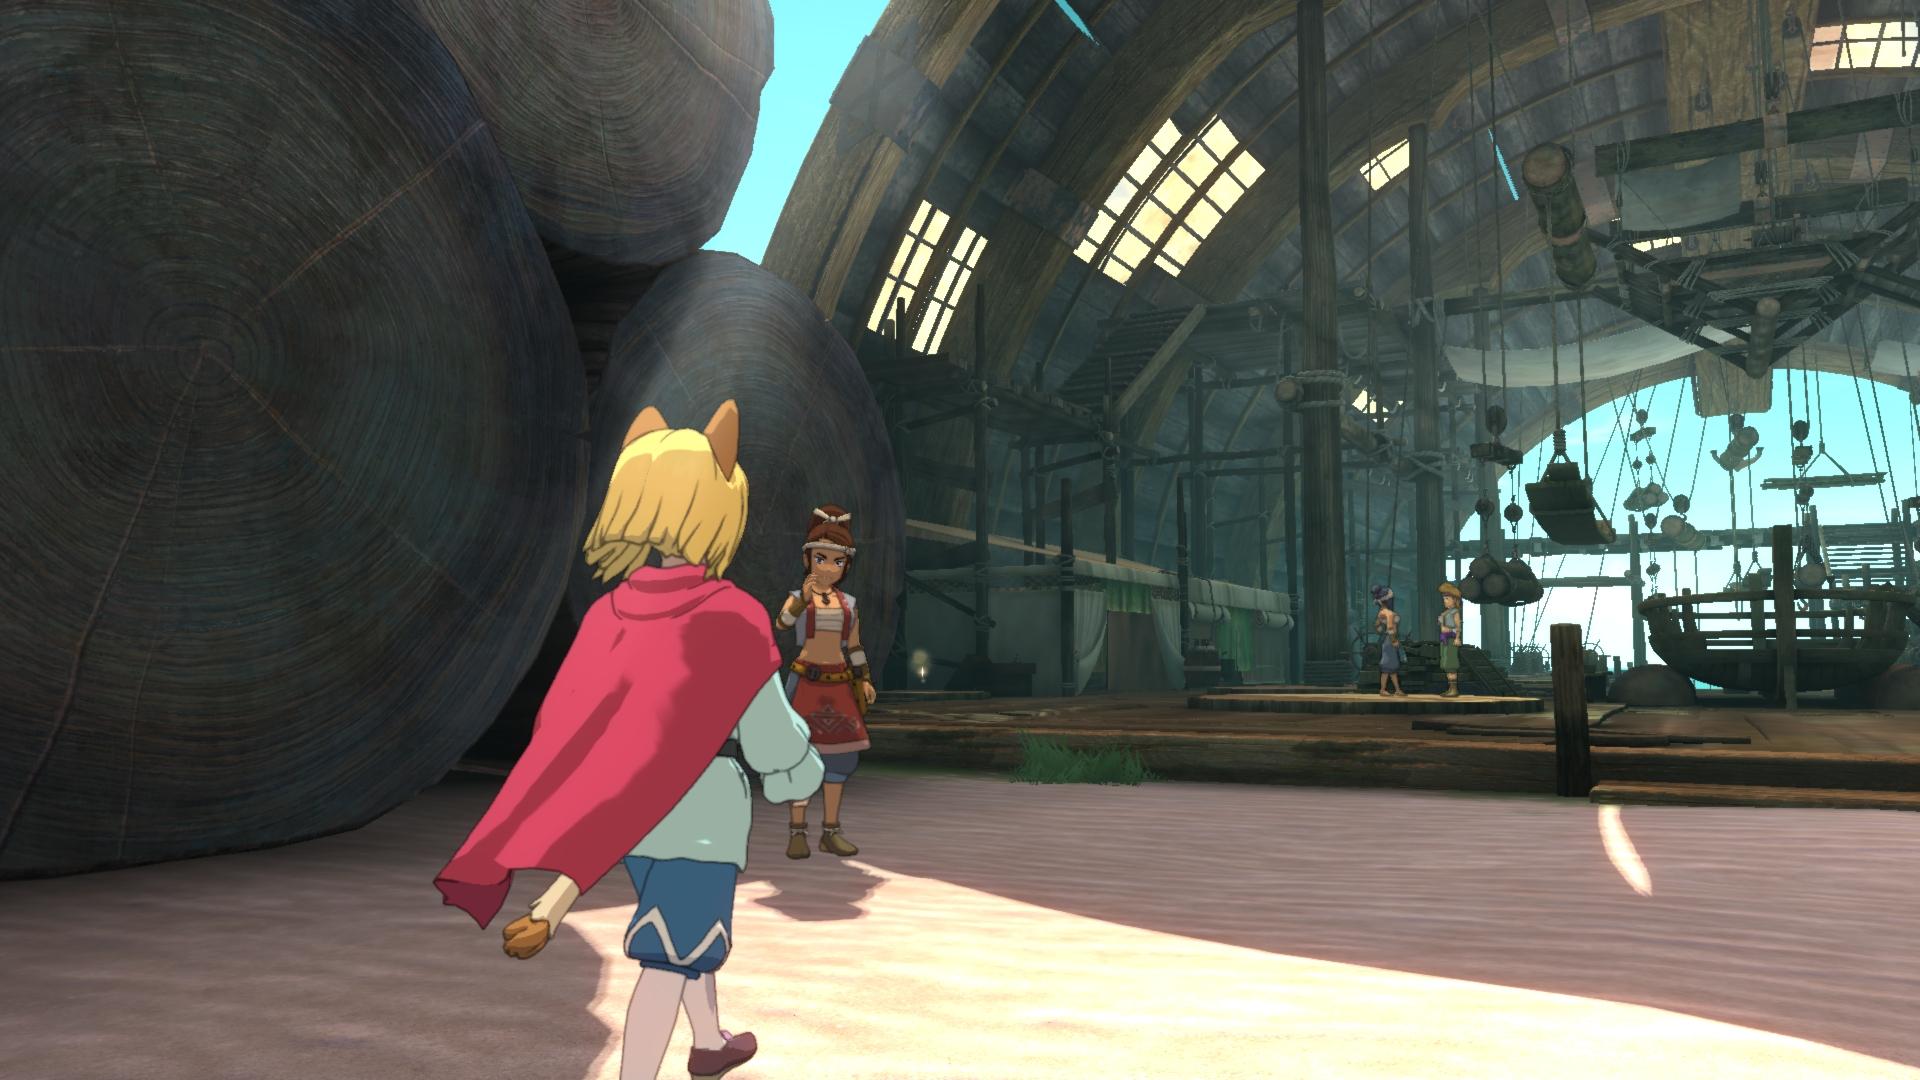 Ni no Kuni II: Revenant Kingdom v traileru a na screenshotech pro letošní Gamescom 148573